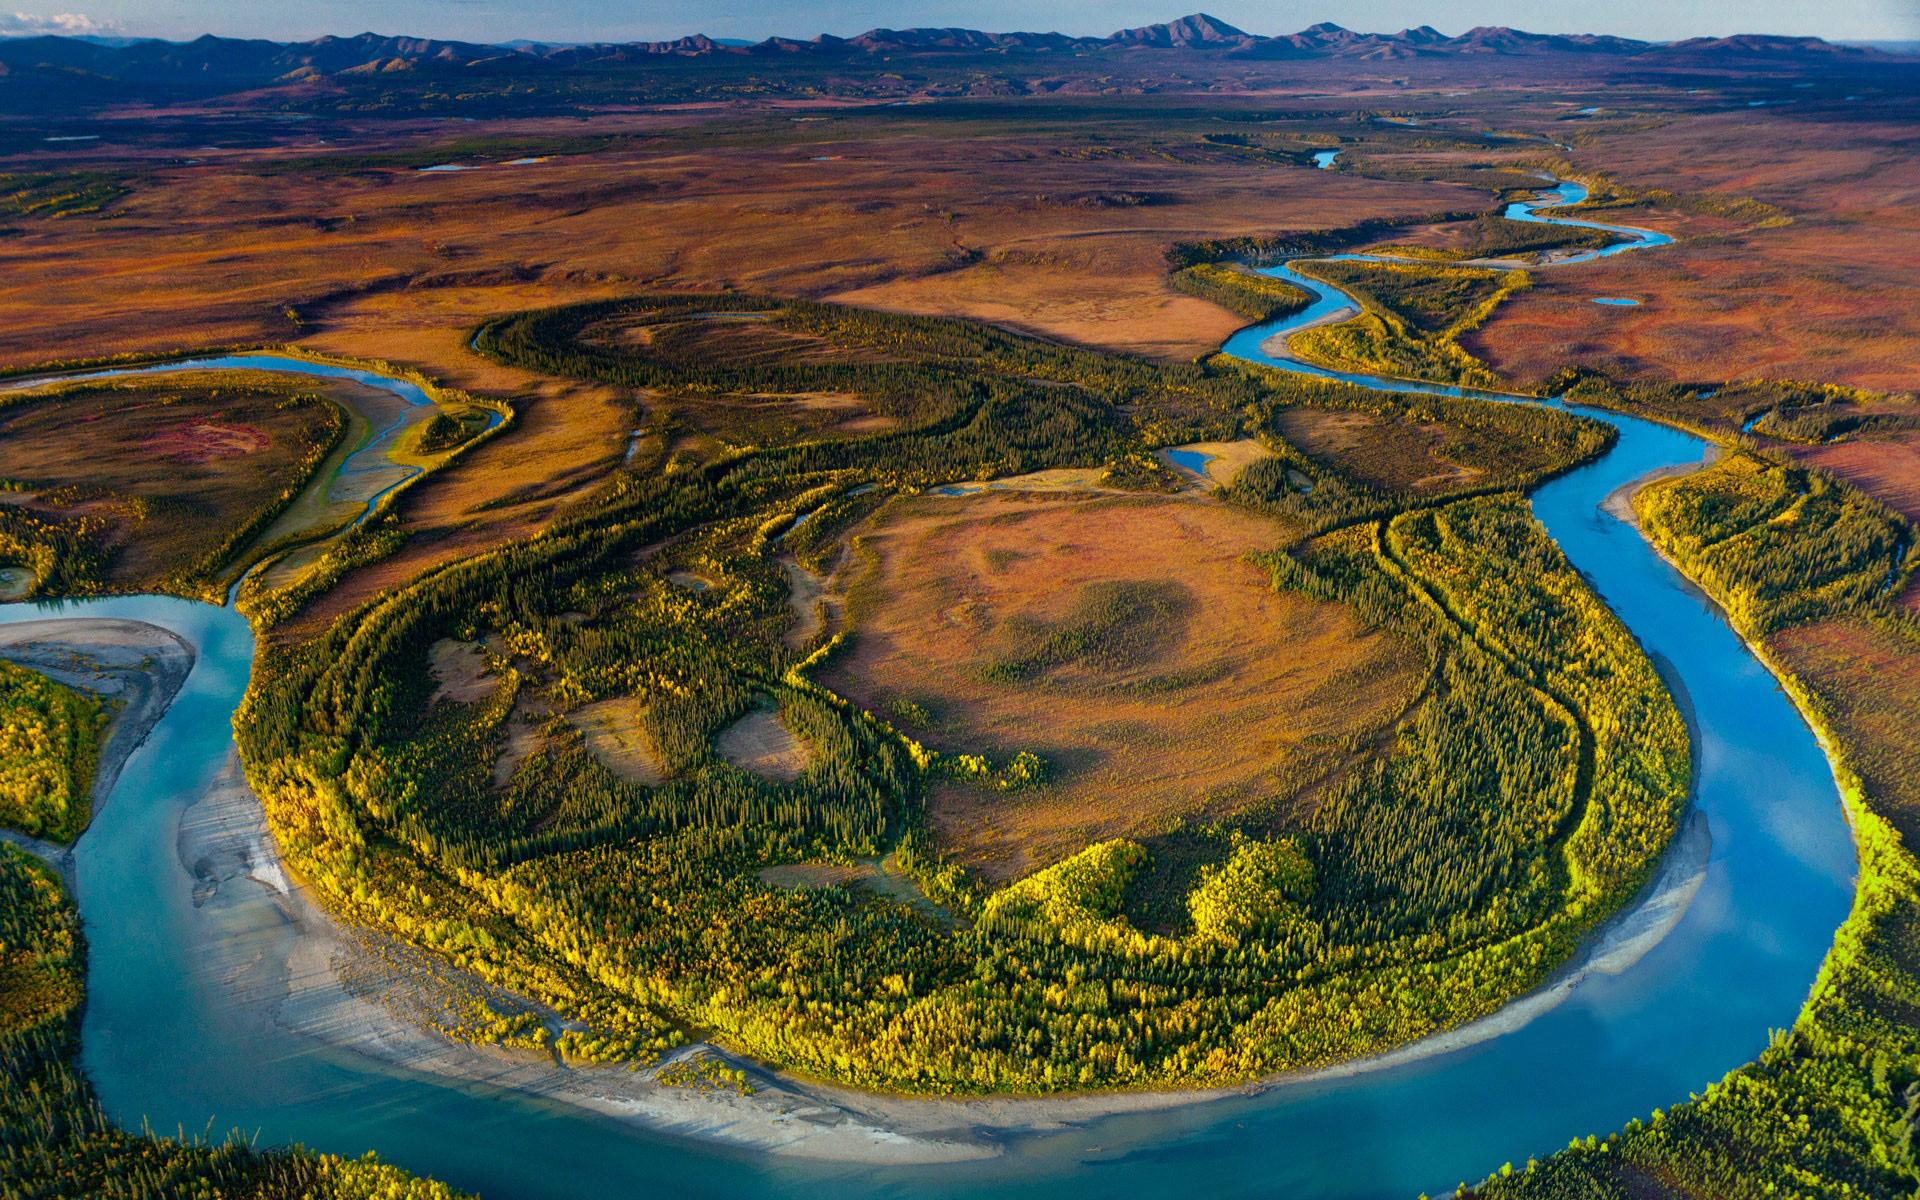 Bing Fall Desktop Wallpaper Gates Of The Arctic National Park And Preserve Alaska